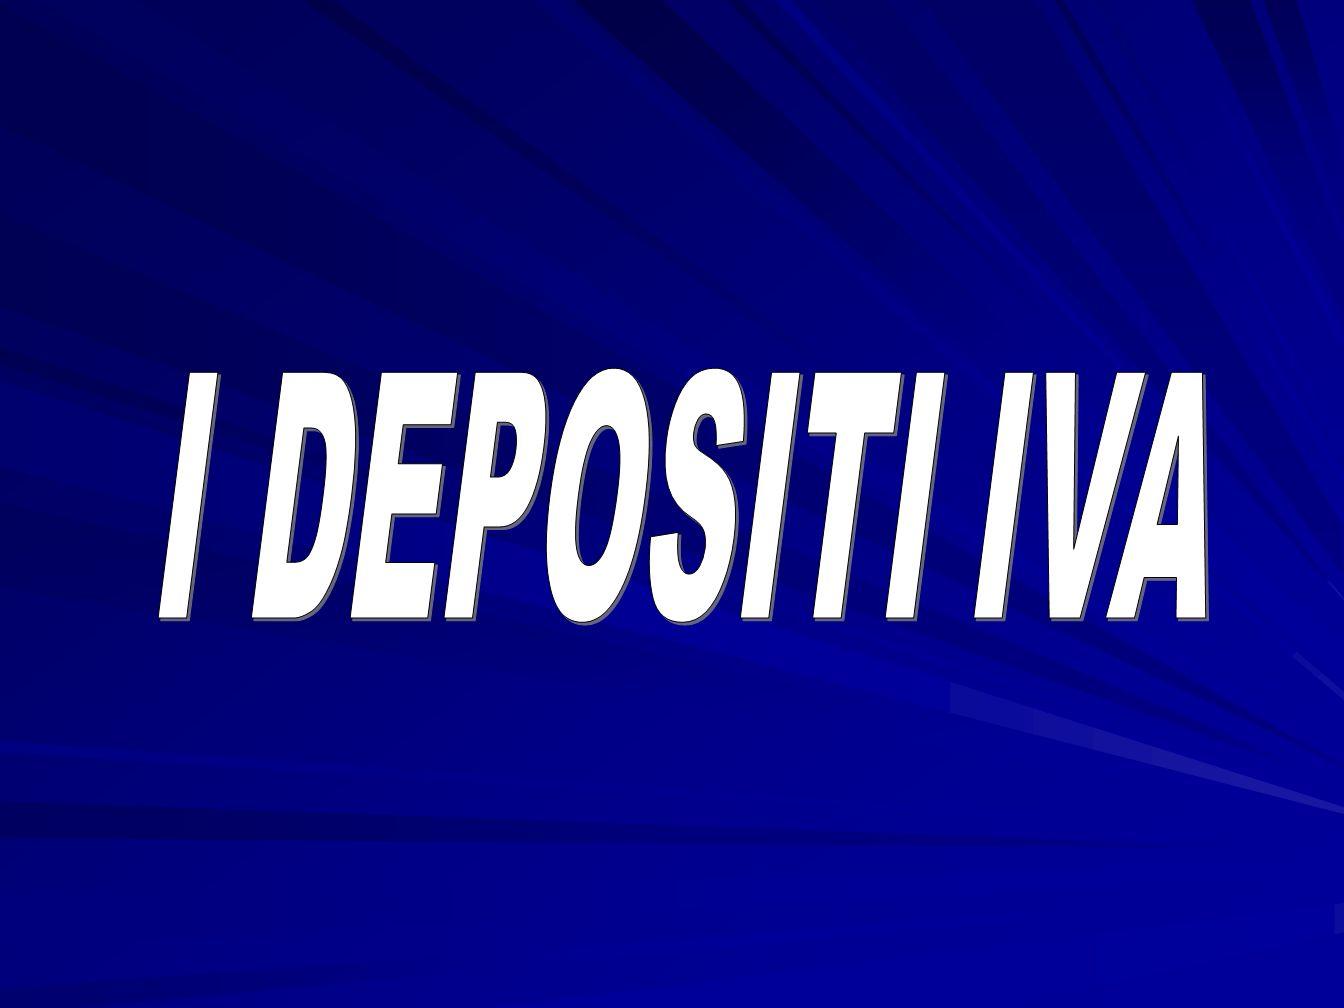 I DEPOSITI IVA